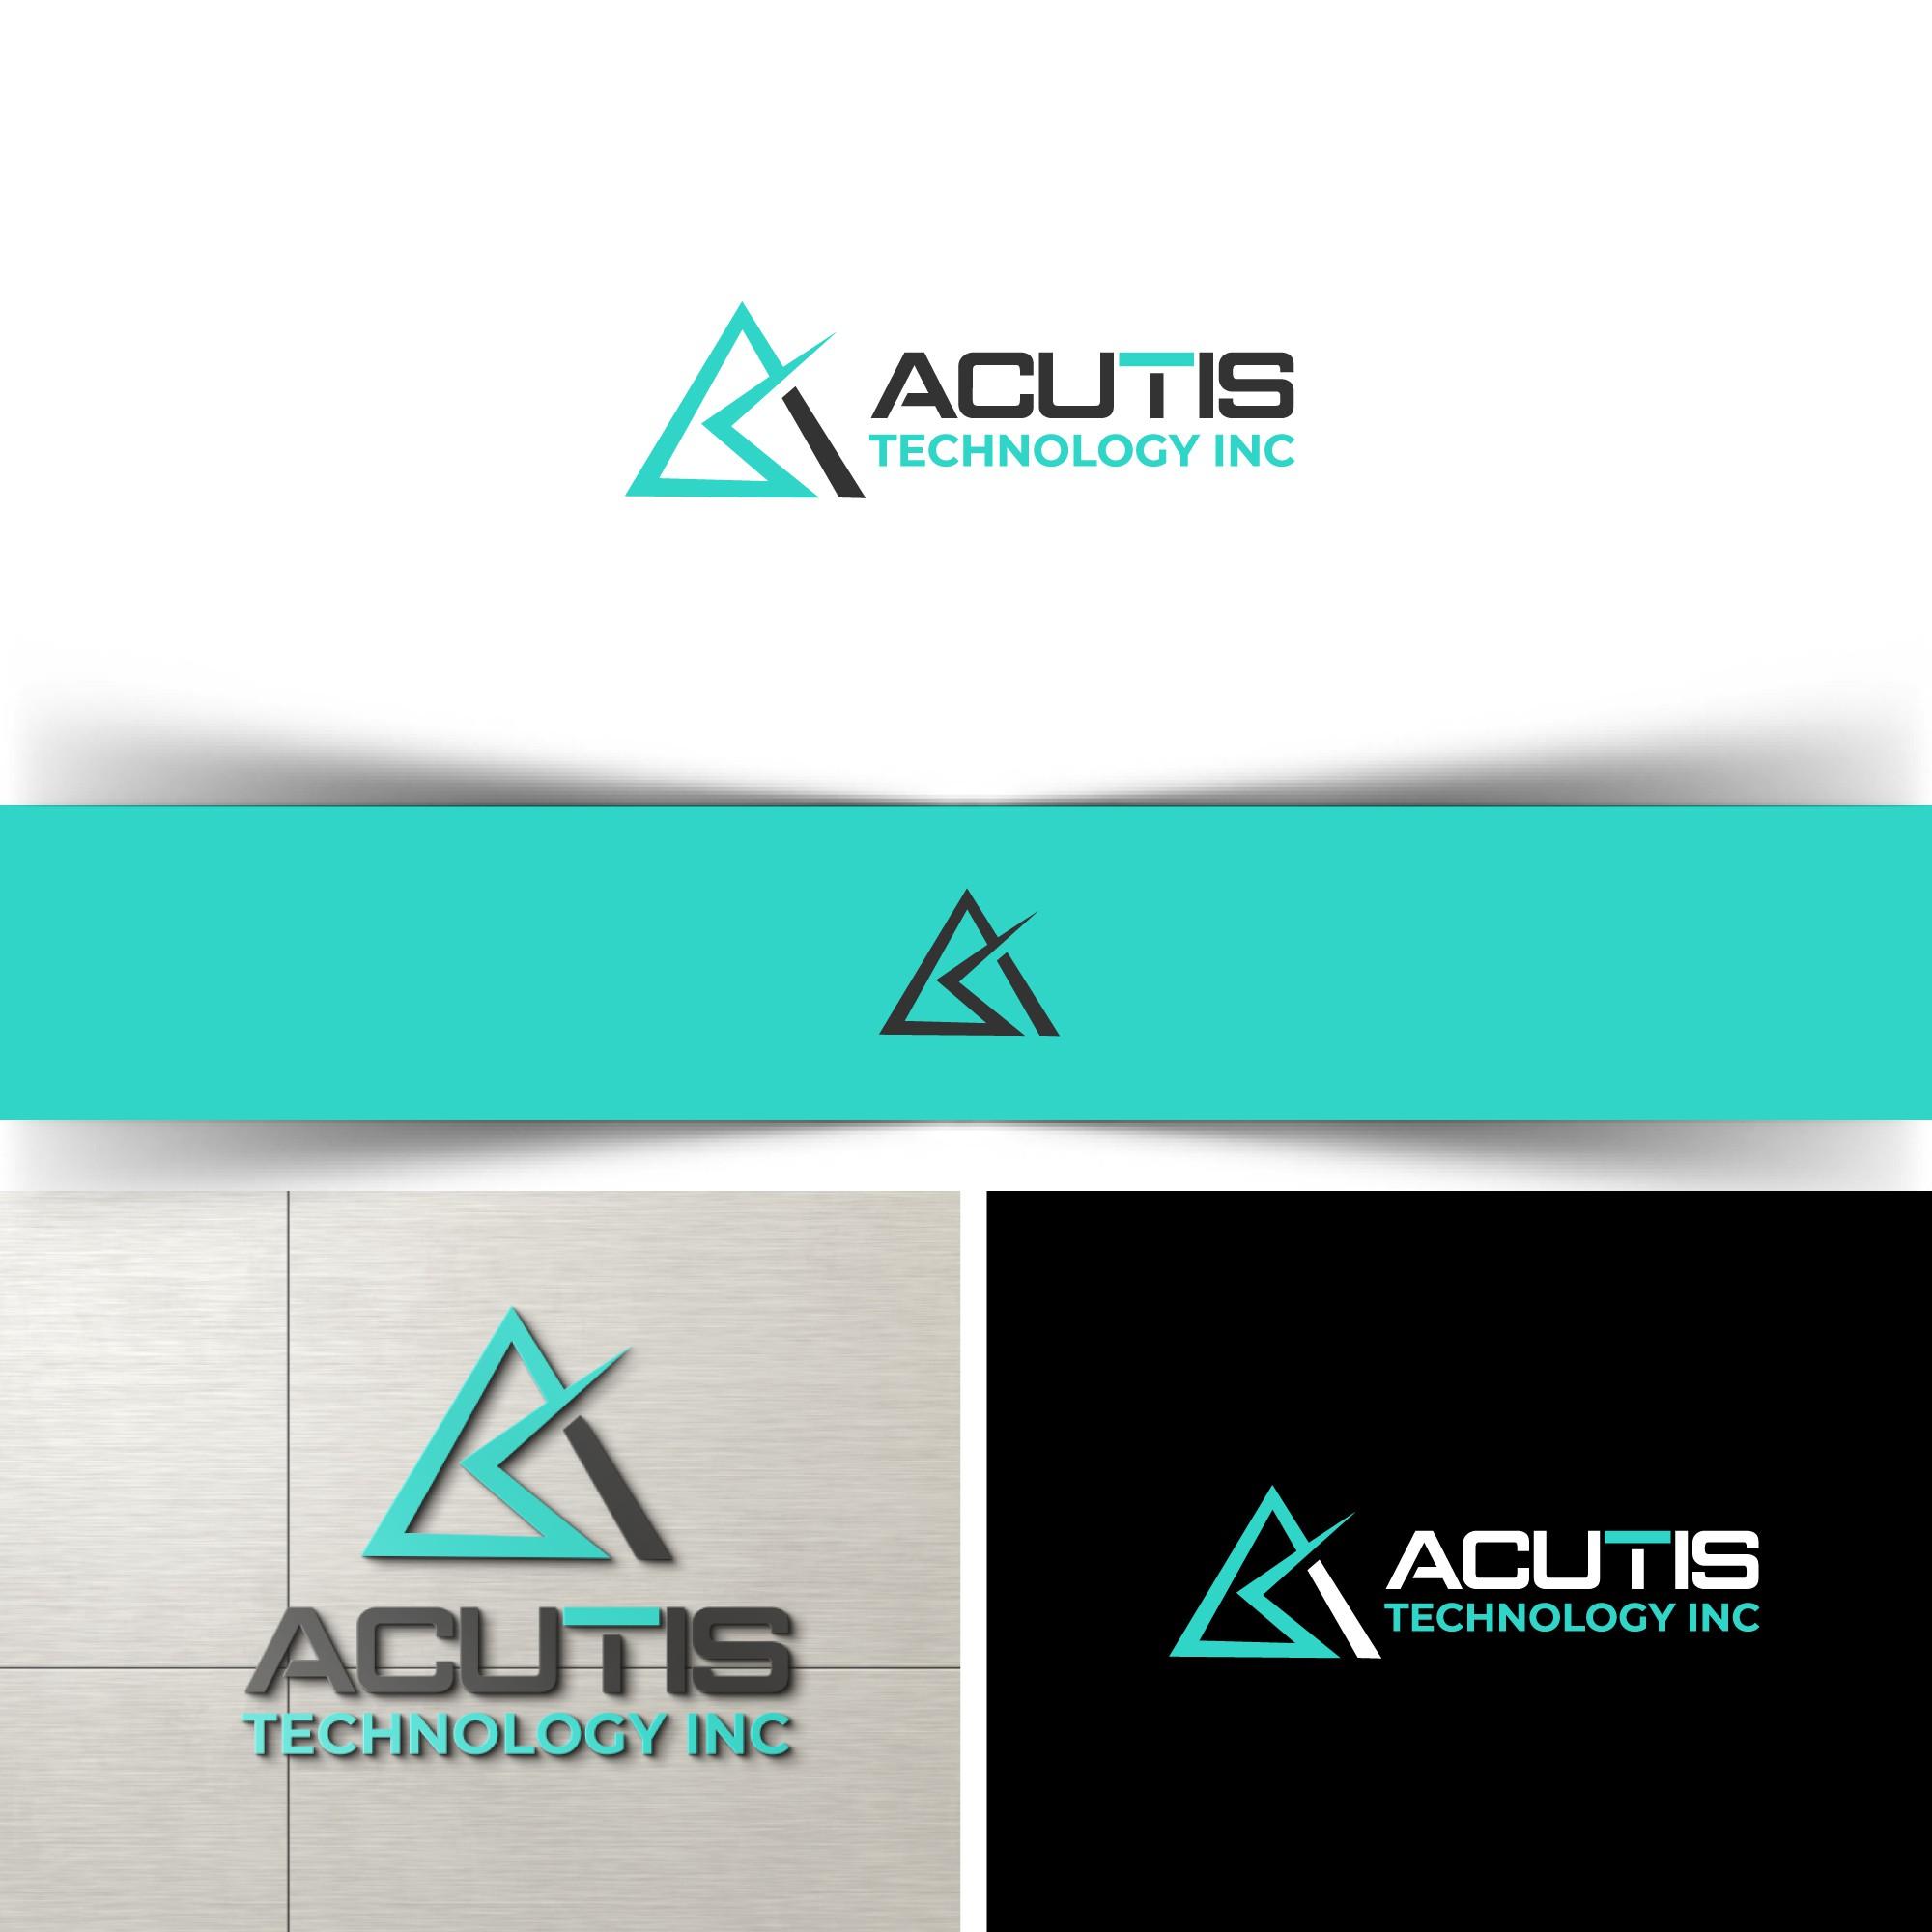 Acutis Technology Inc